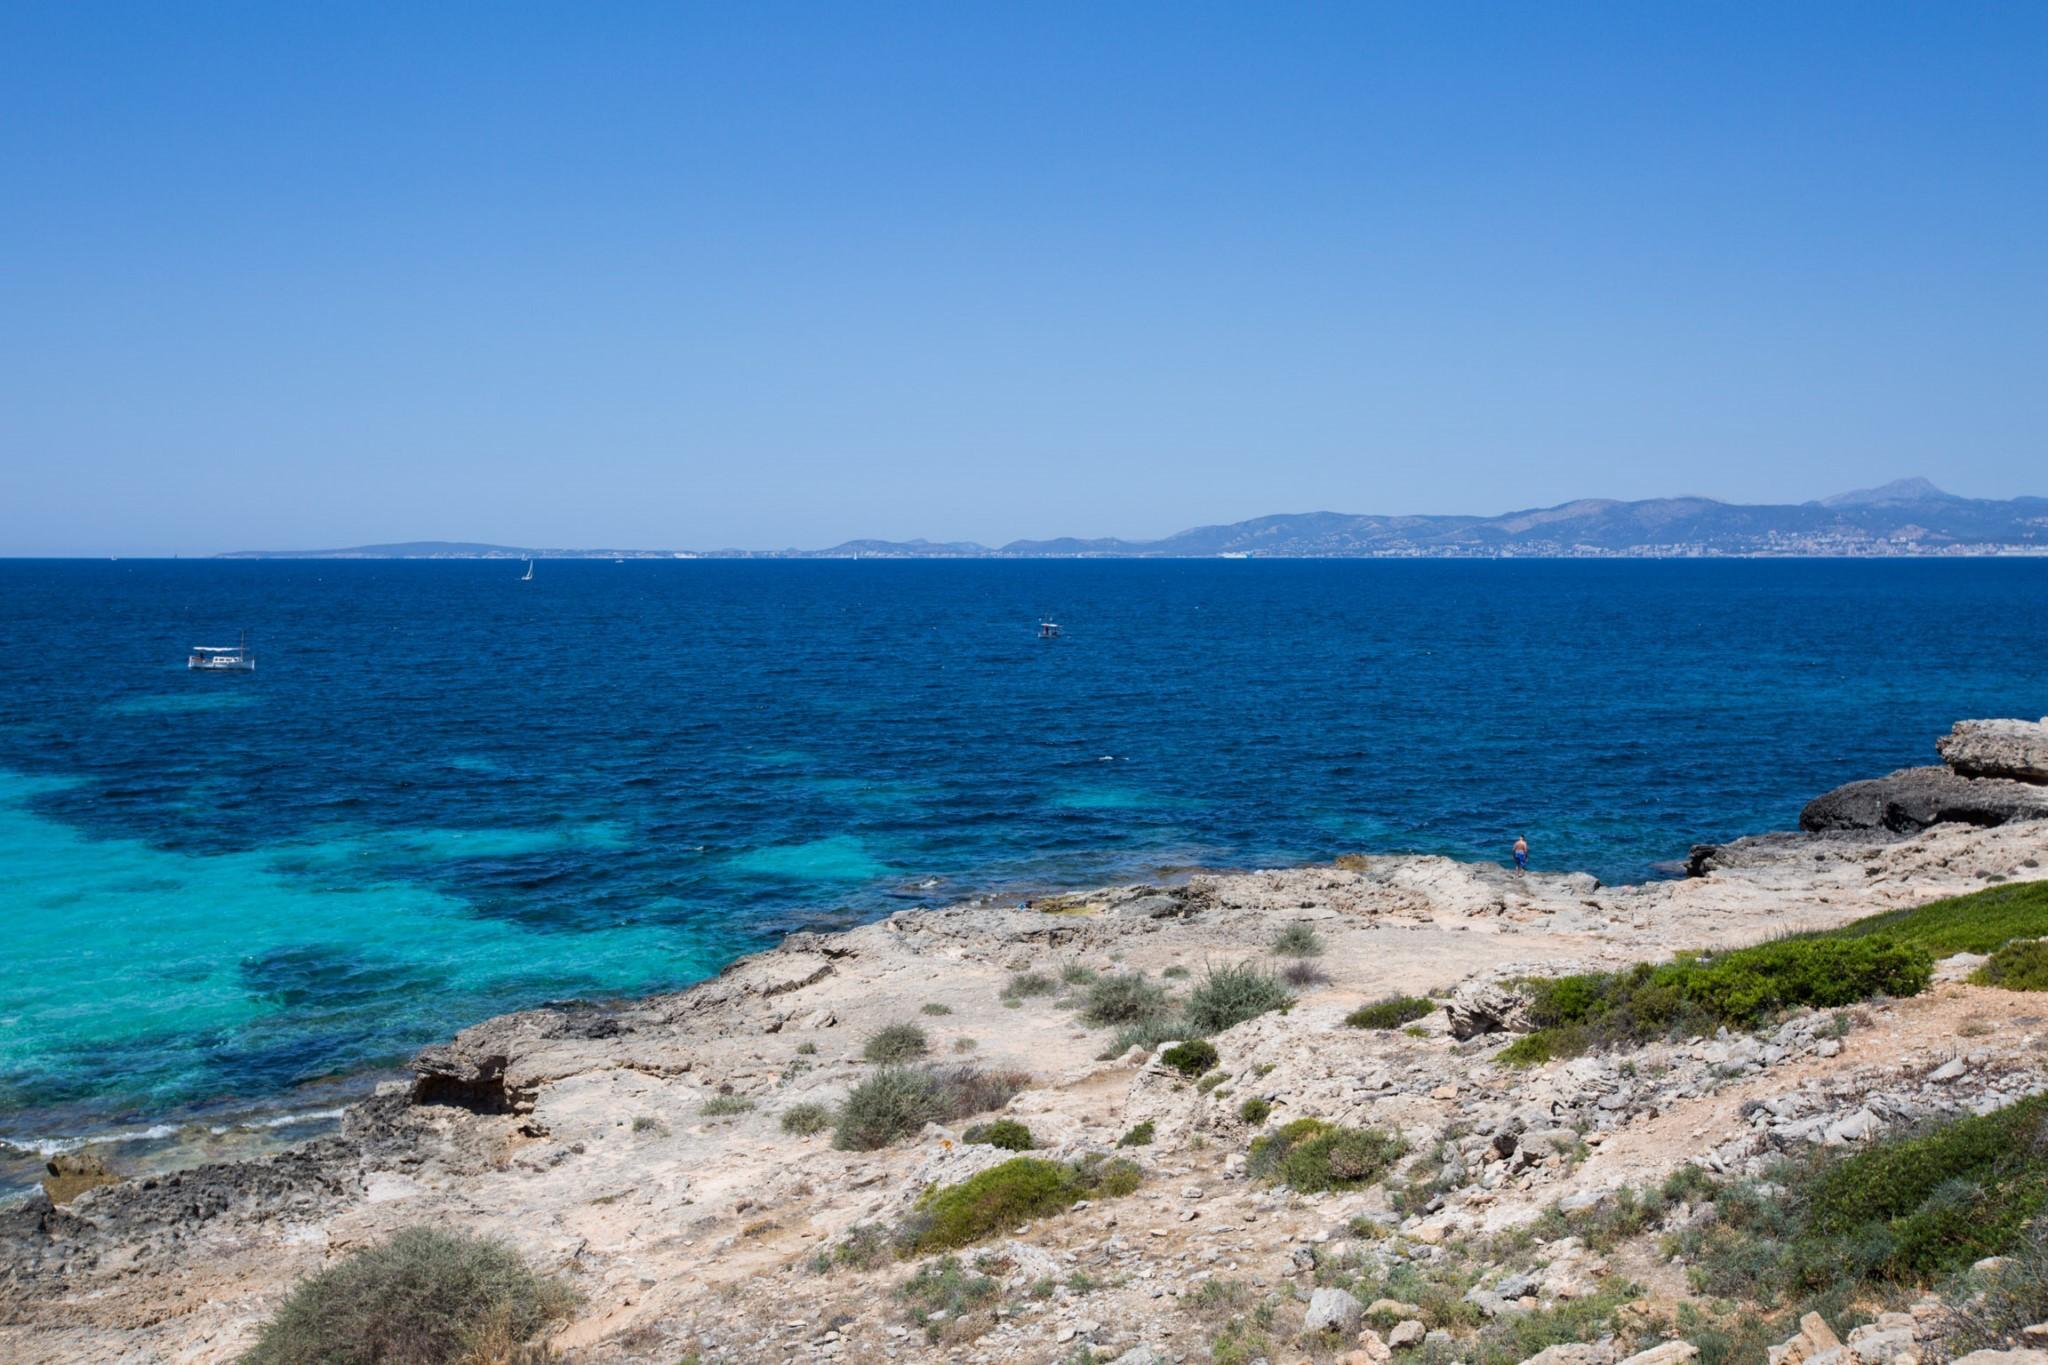 Ferienhaus CAN GORI (2296828), Badia Gran, Mallorca, Balearische Inseln, Spanien, Bild 36